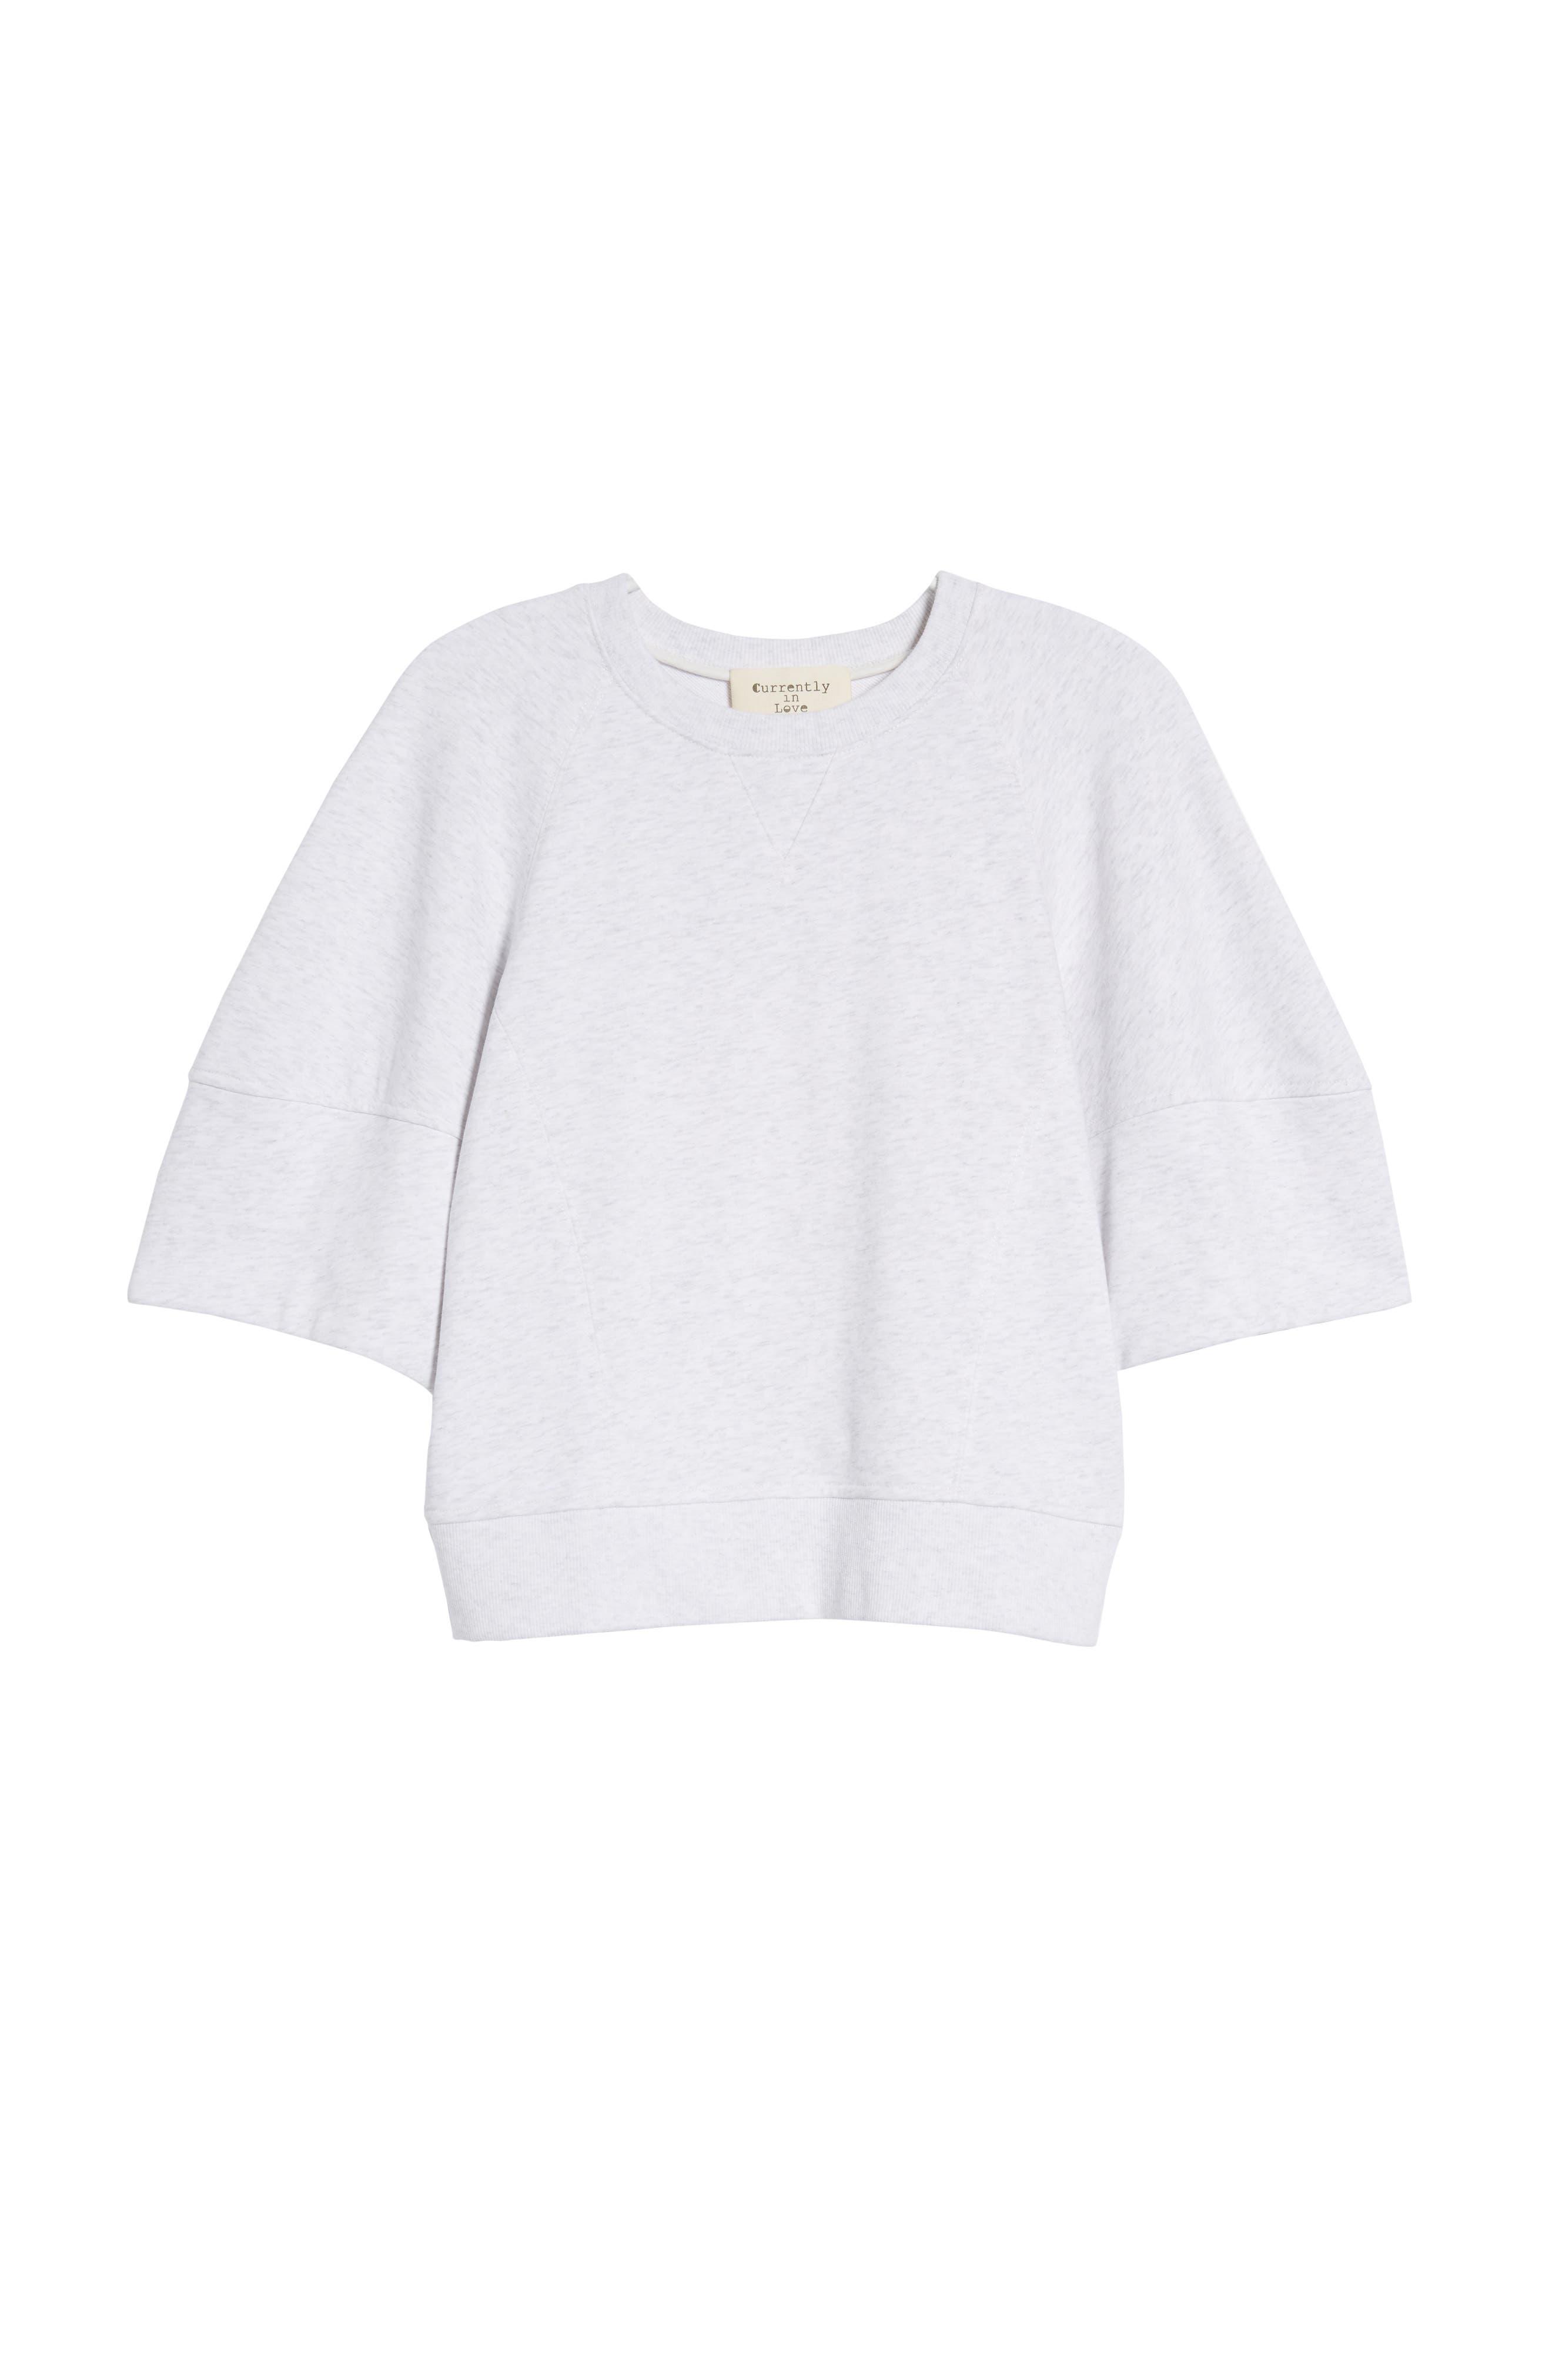 Puff Sleeve Sweatshirt,                             Alternate thumbnail 7, color,                             025